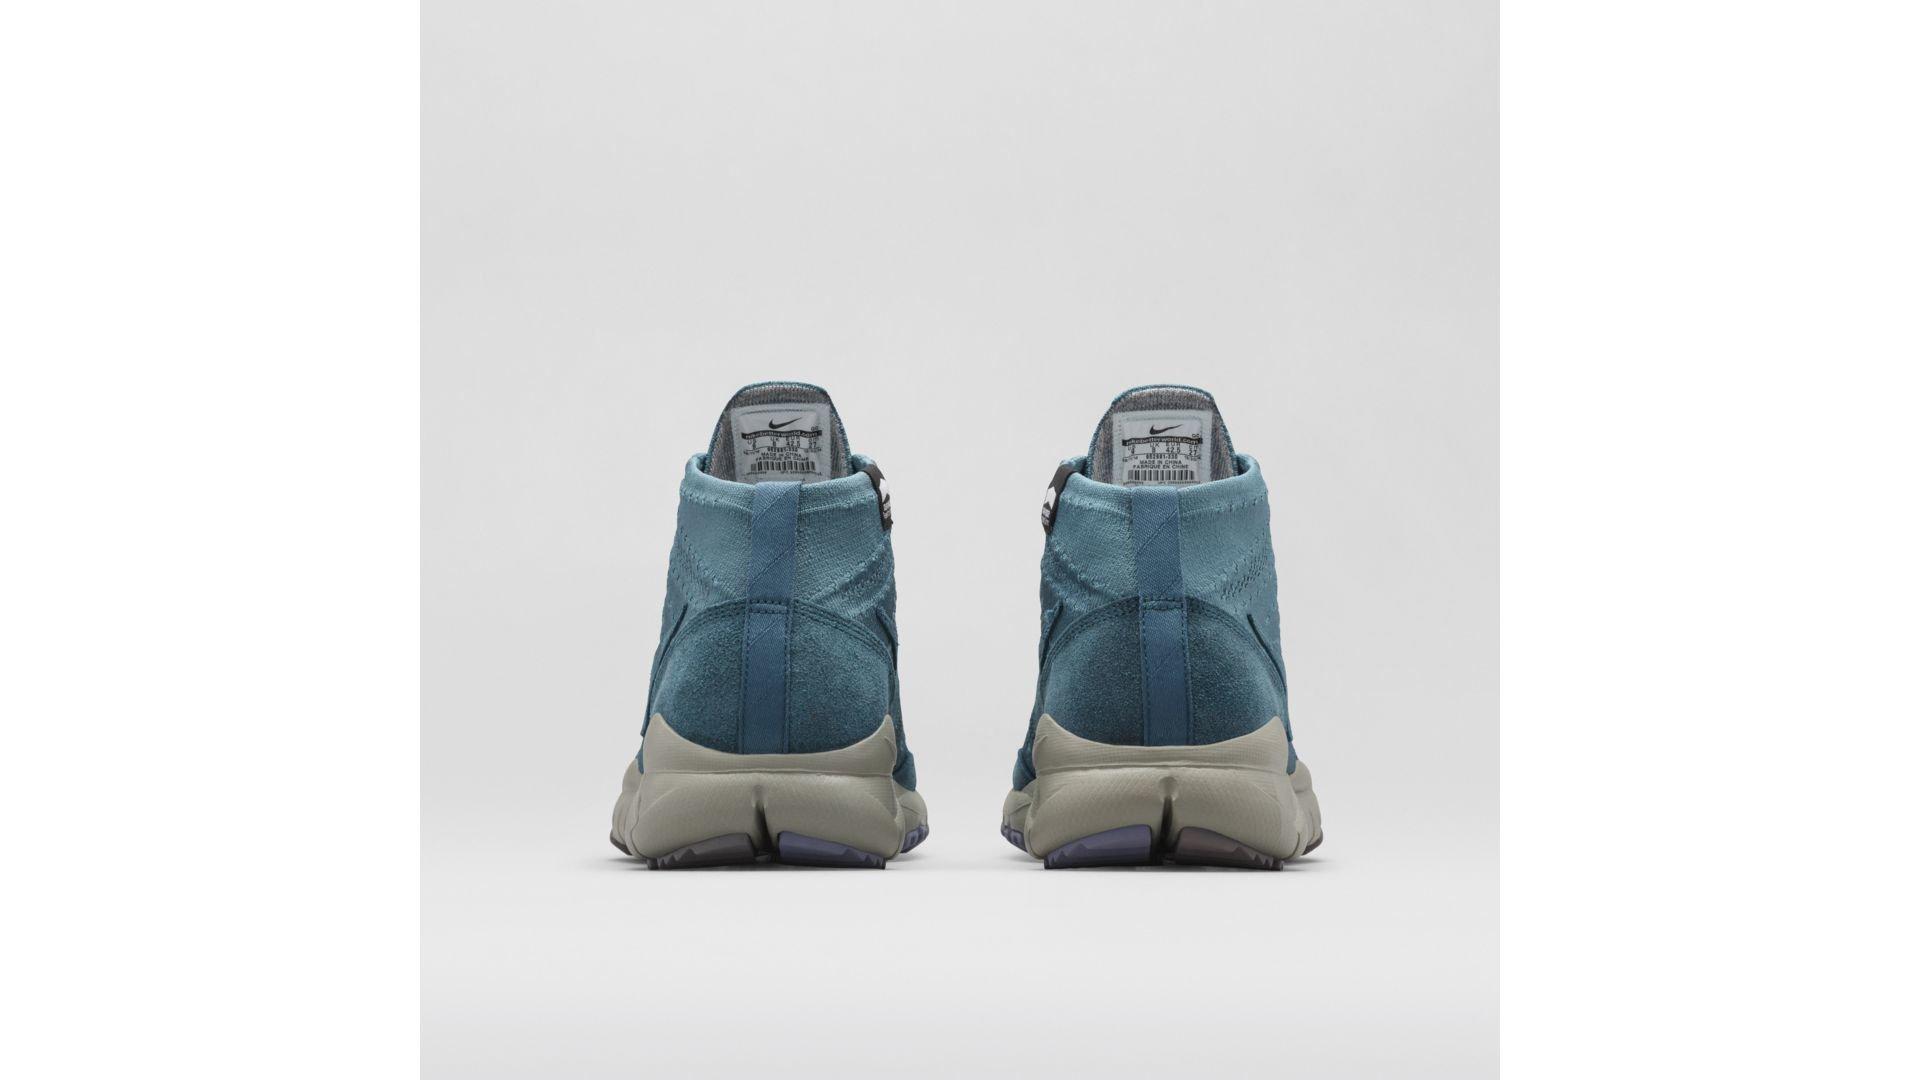 Nike Free Flyknit Chukka SFB Night Factor (652961-330)